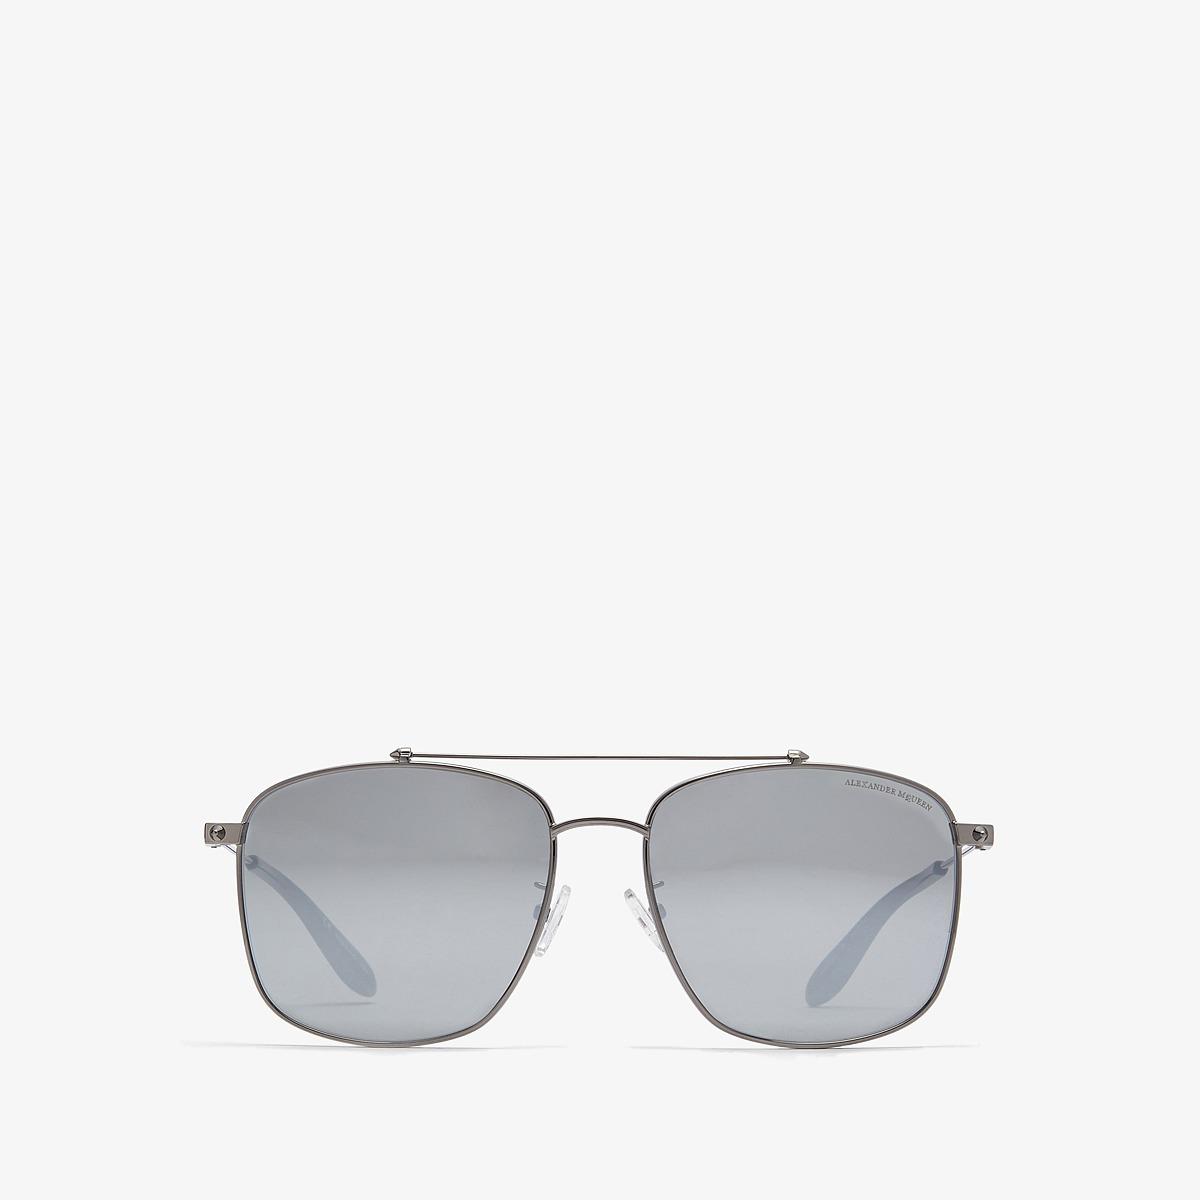 Alexander McQueen - AM0124SK (Dark Ruthenium/Silver) Fashion Sunglasses